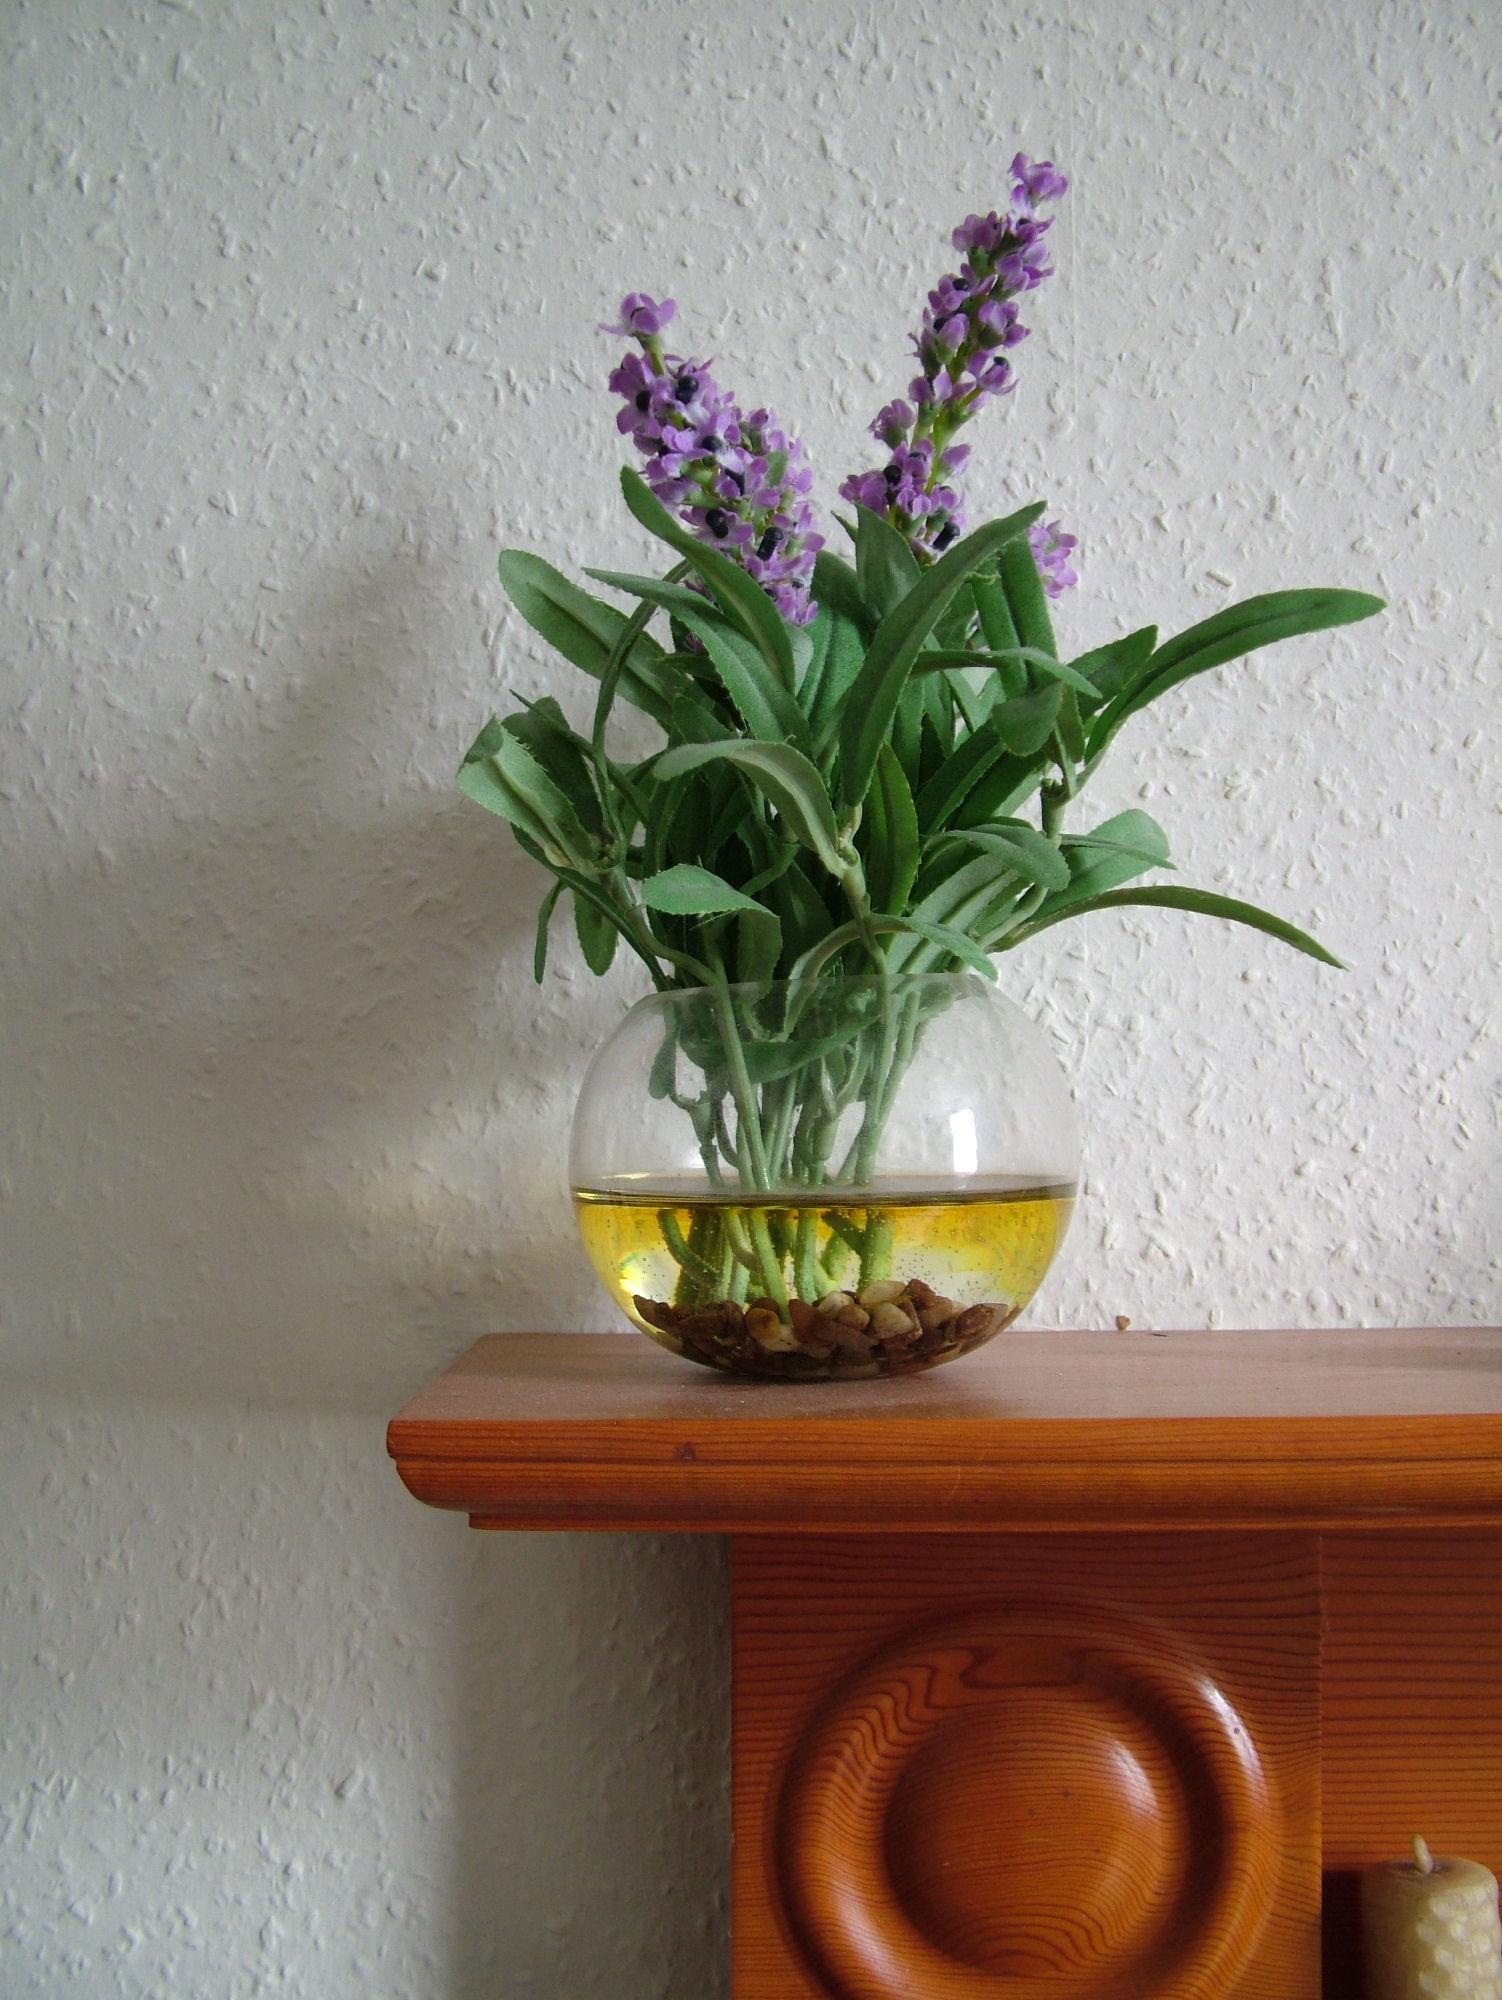 Let lavender soothe your stress